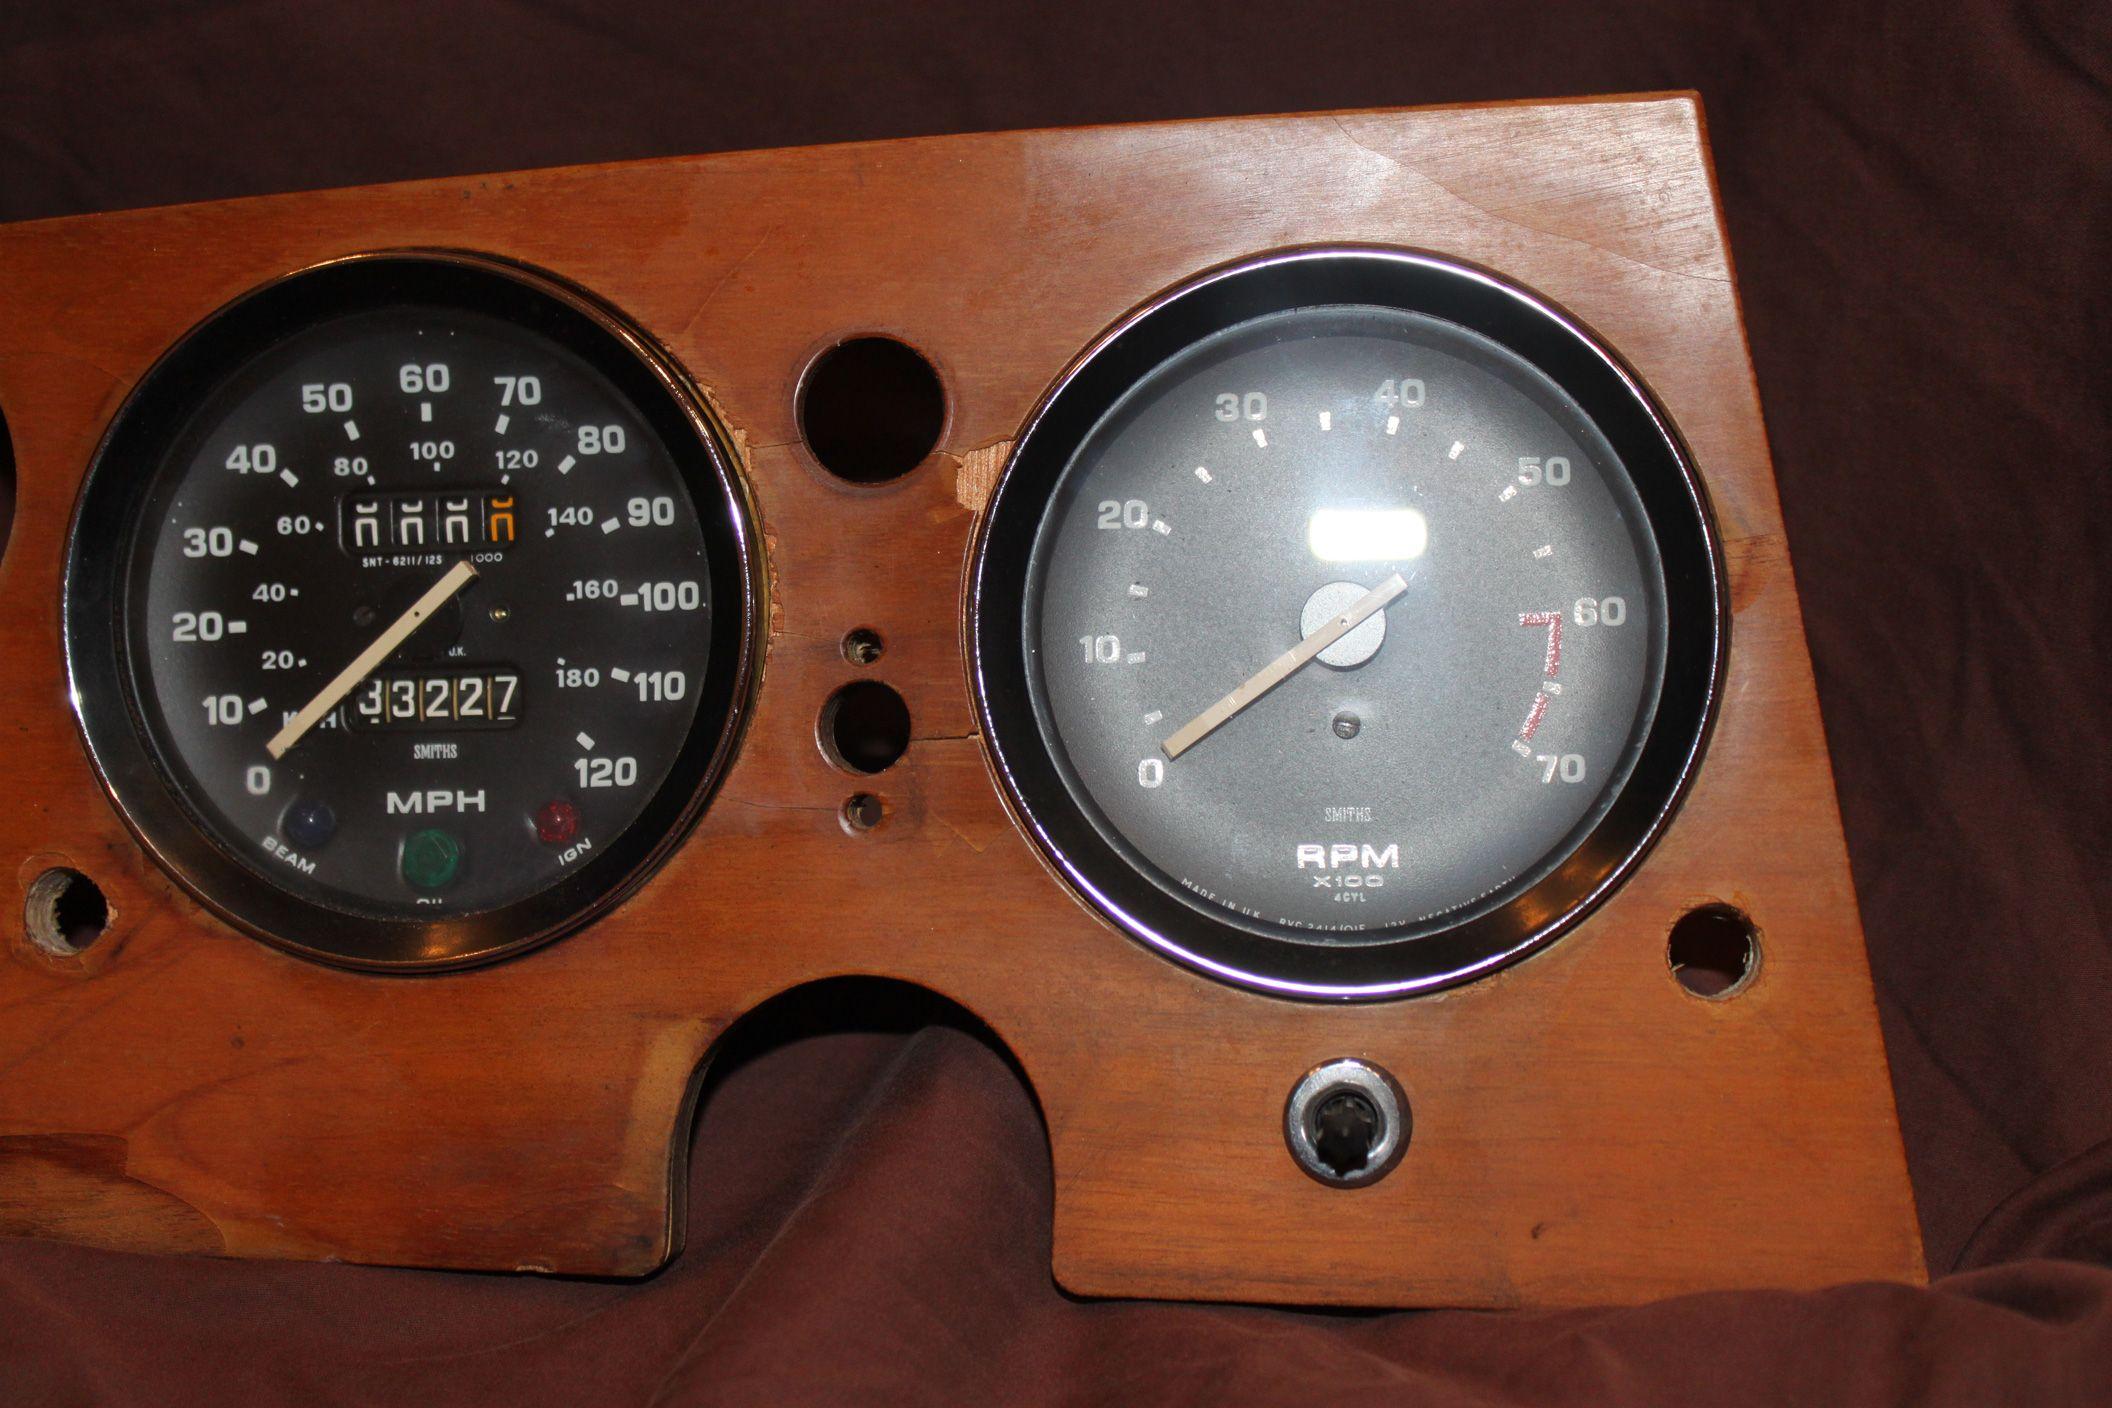 Moving a Spitfire Odometer Reset Knob | Moss Motoring